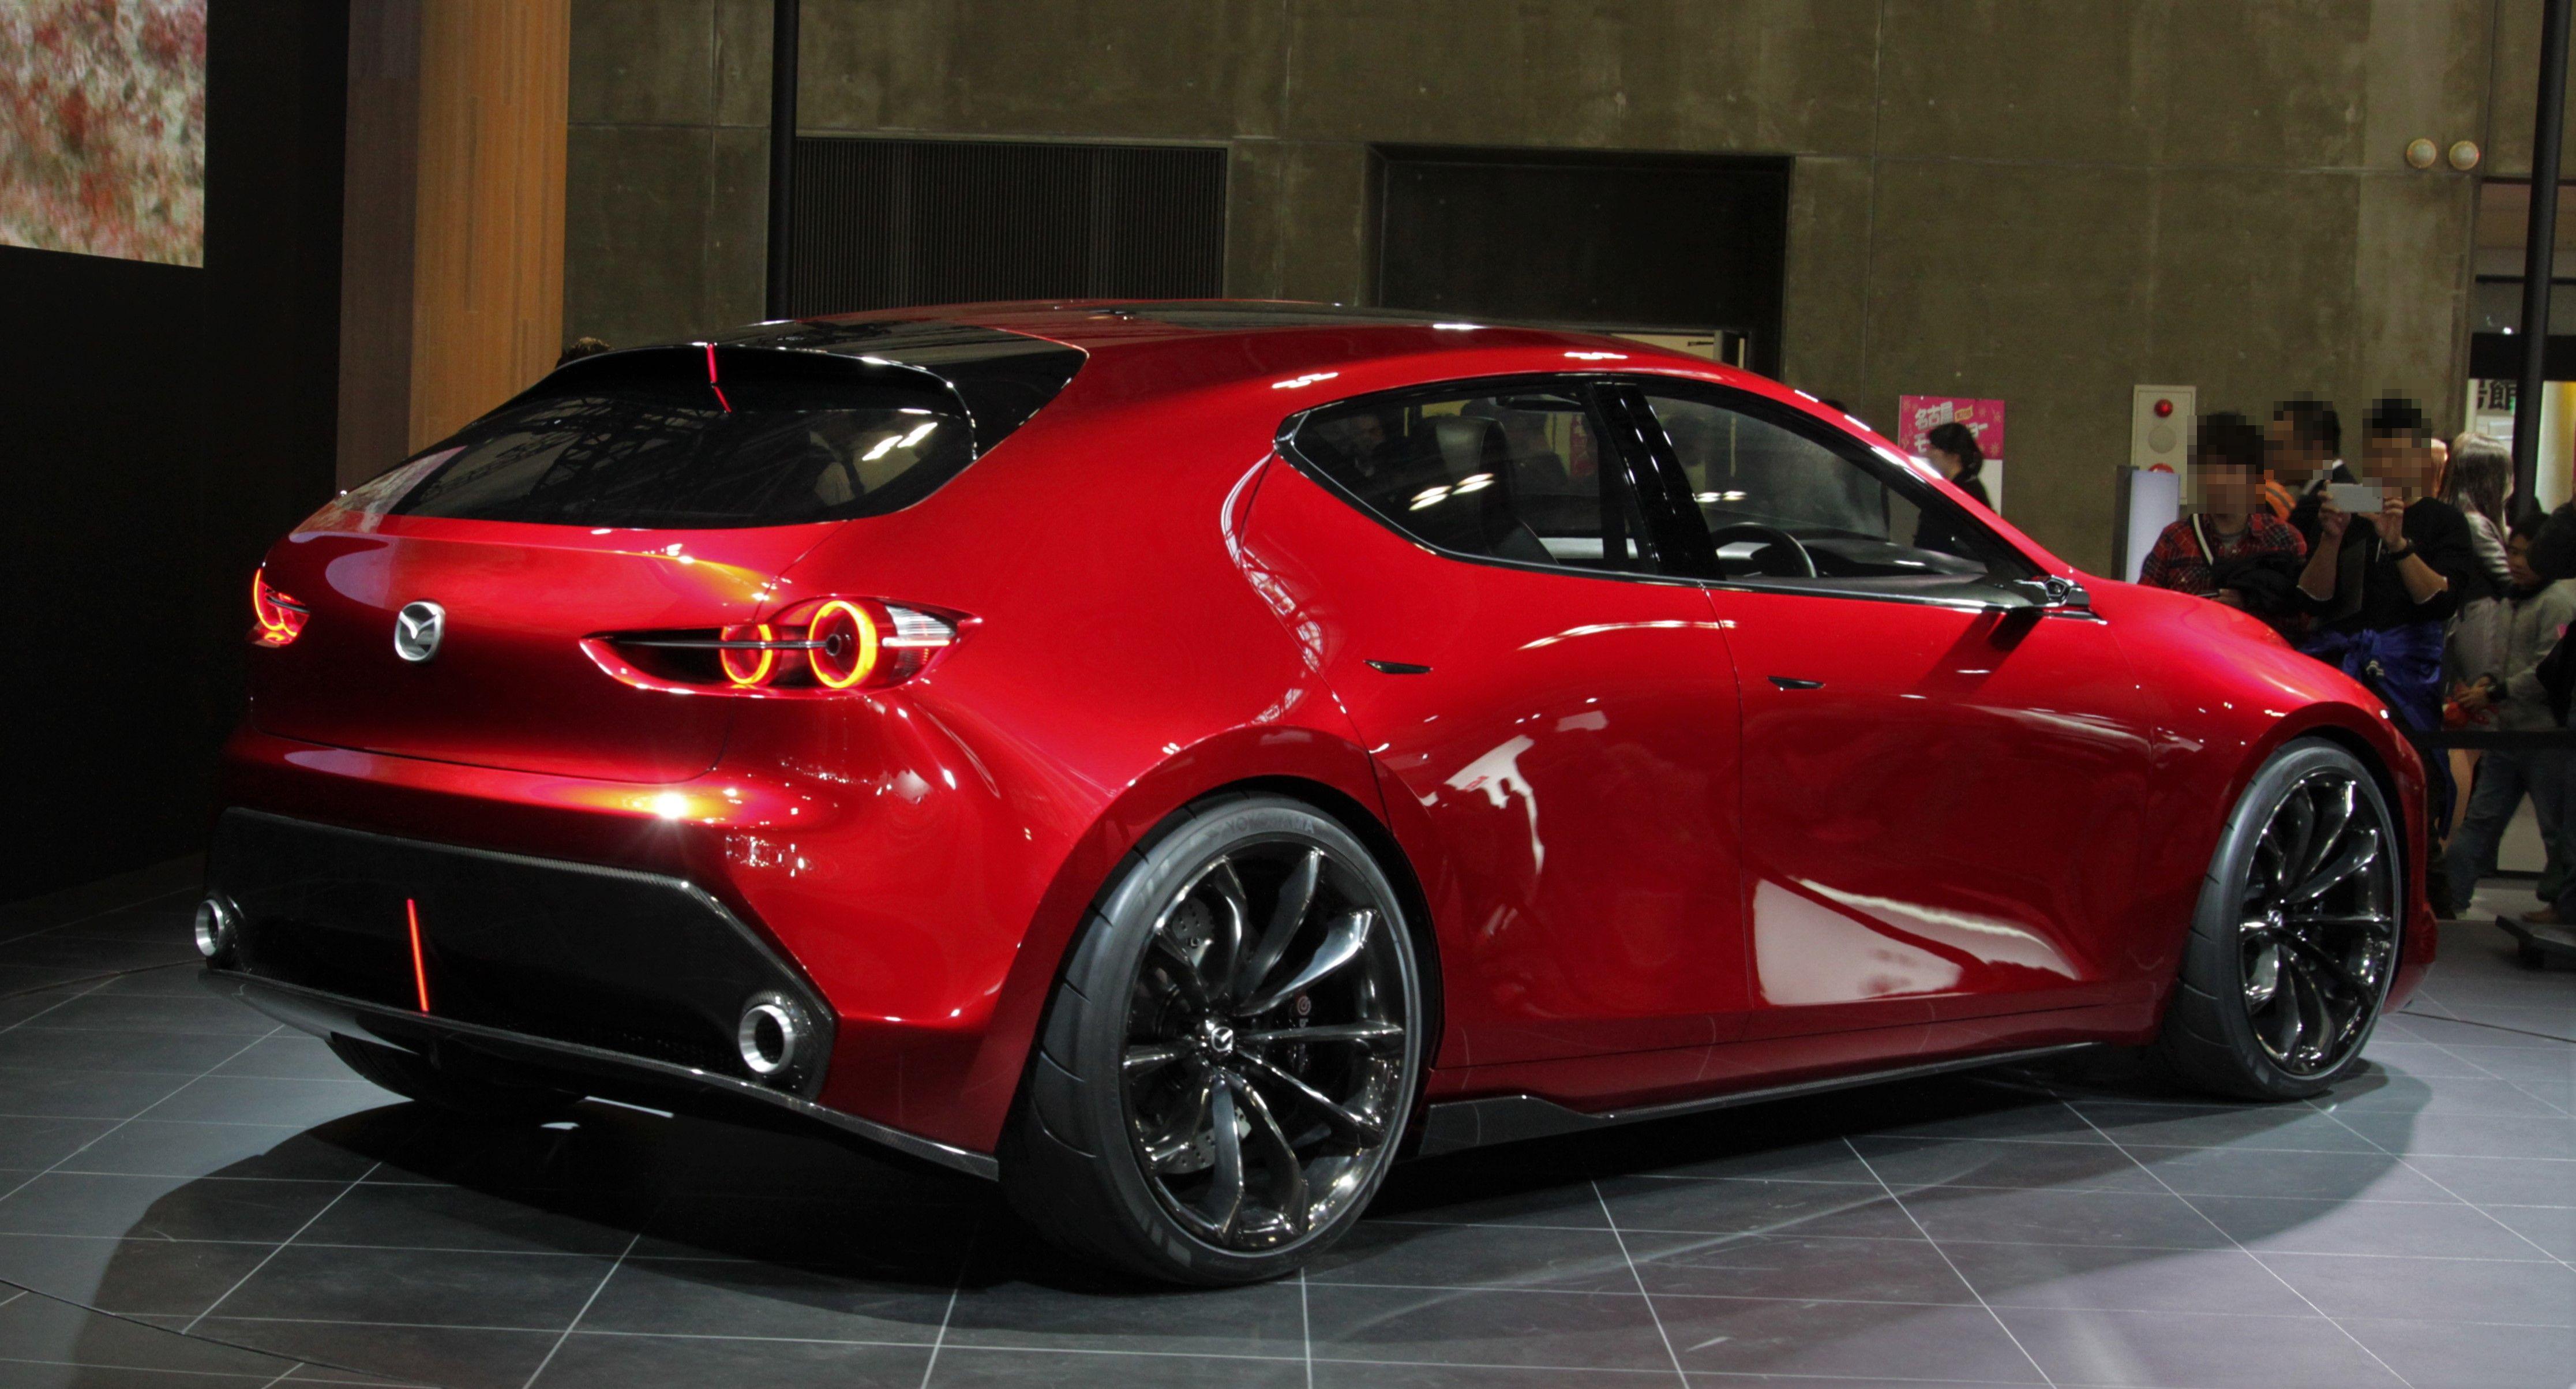 File:Mazda Kai Concept rear.jpg - Wikimedia Commons